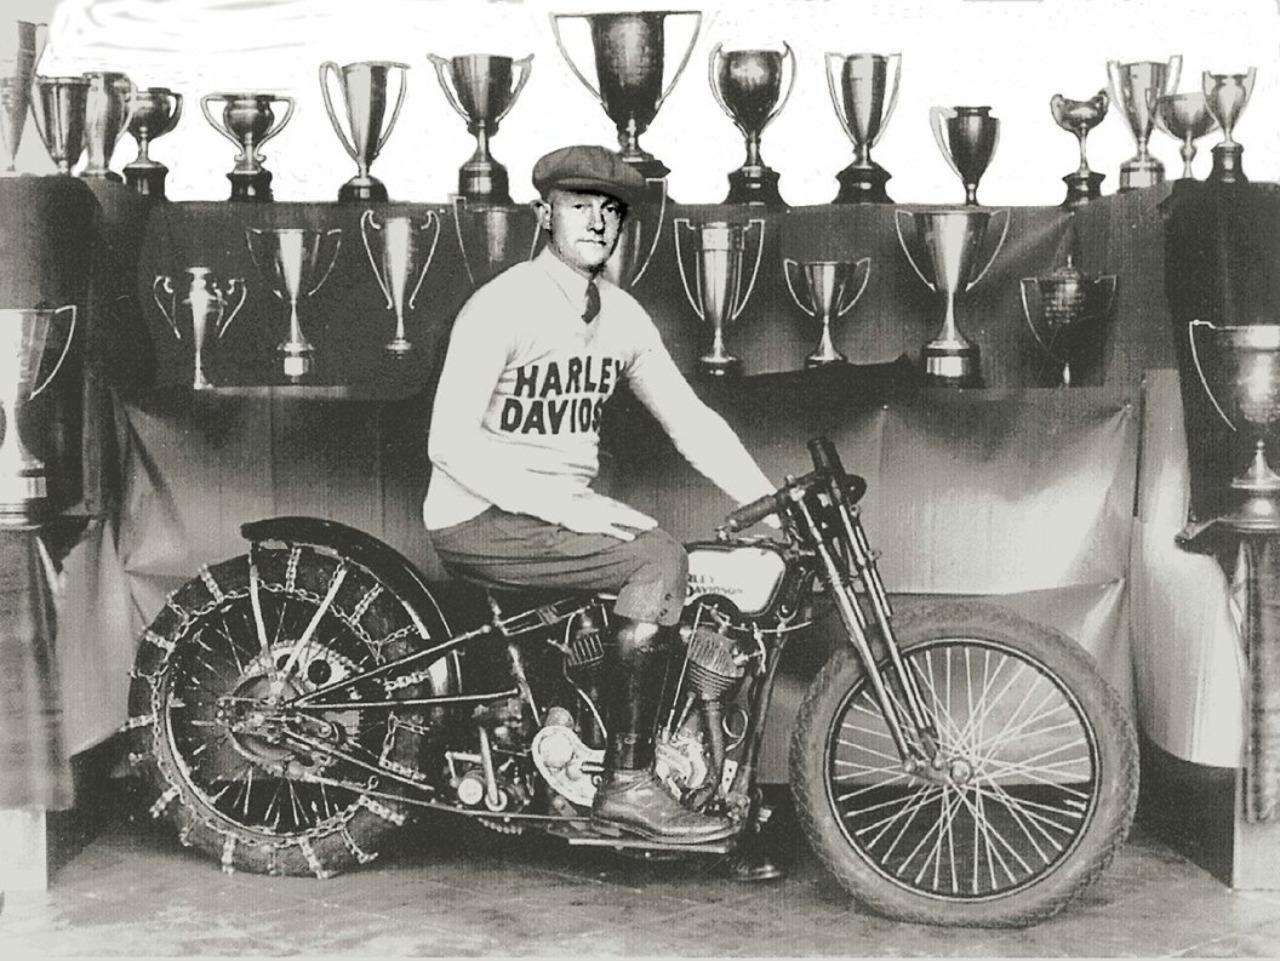 Dudley Perkins ganó numerosas competiciones